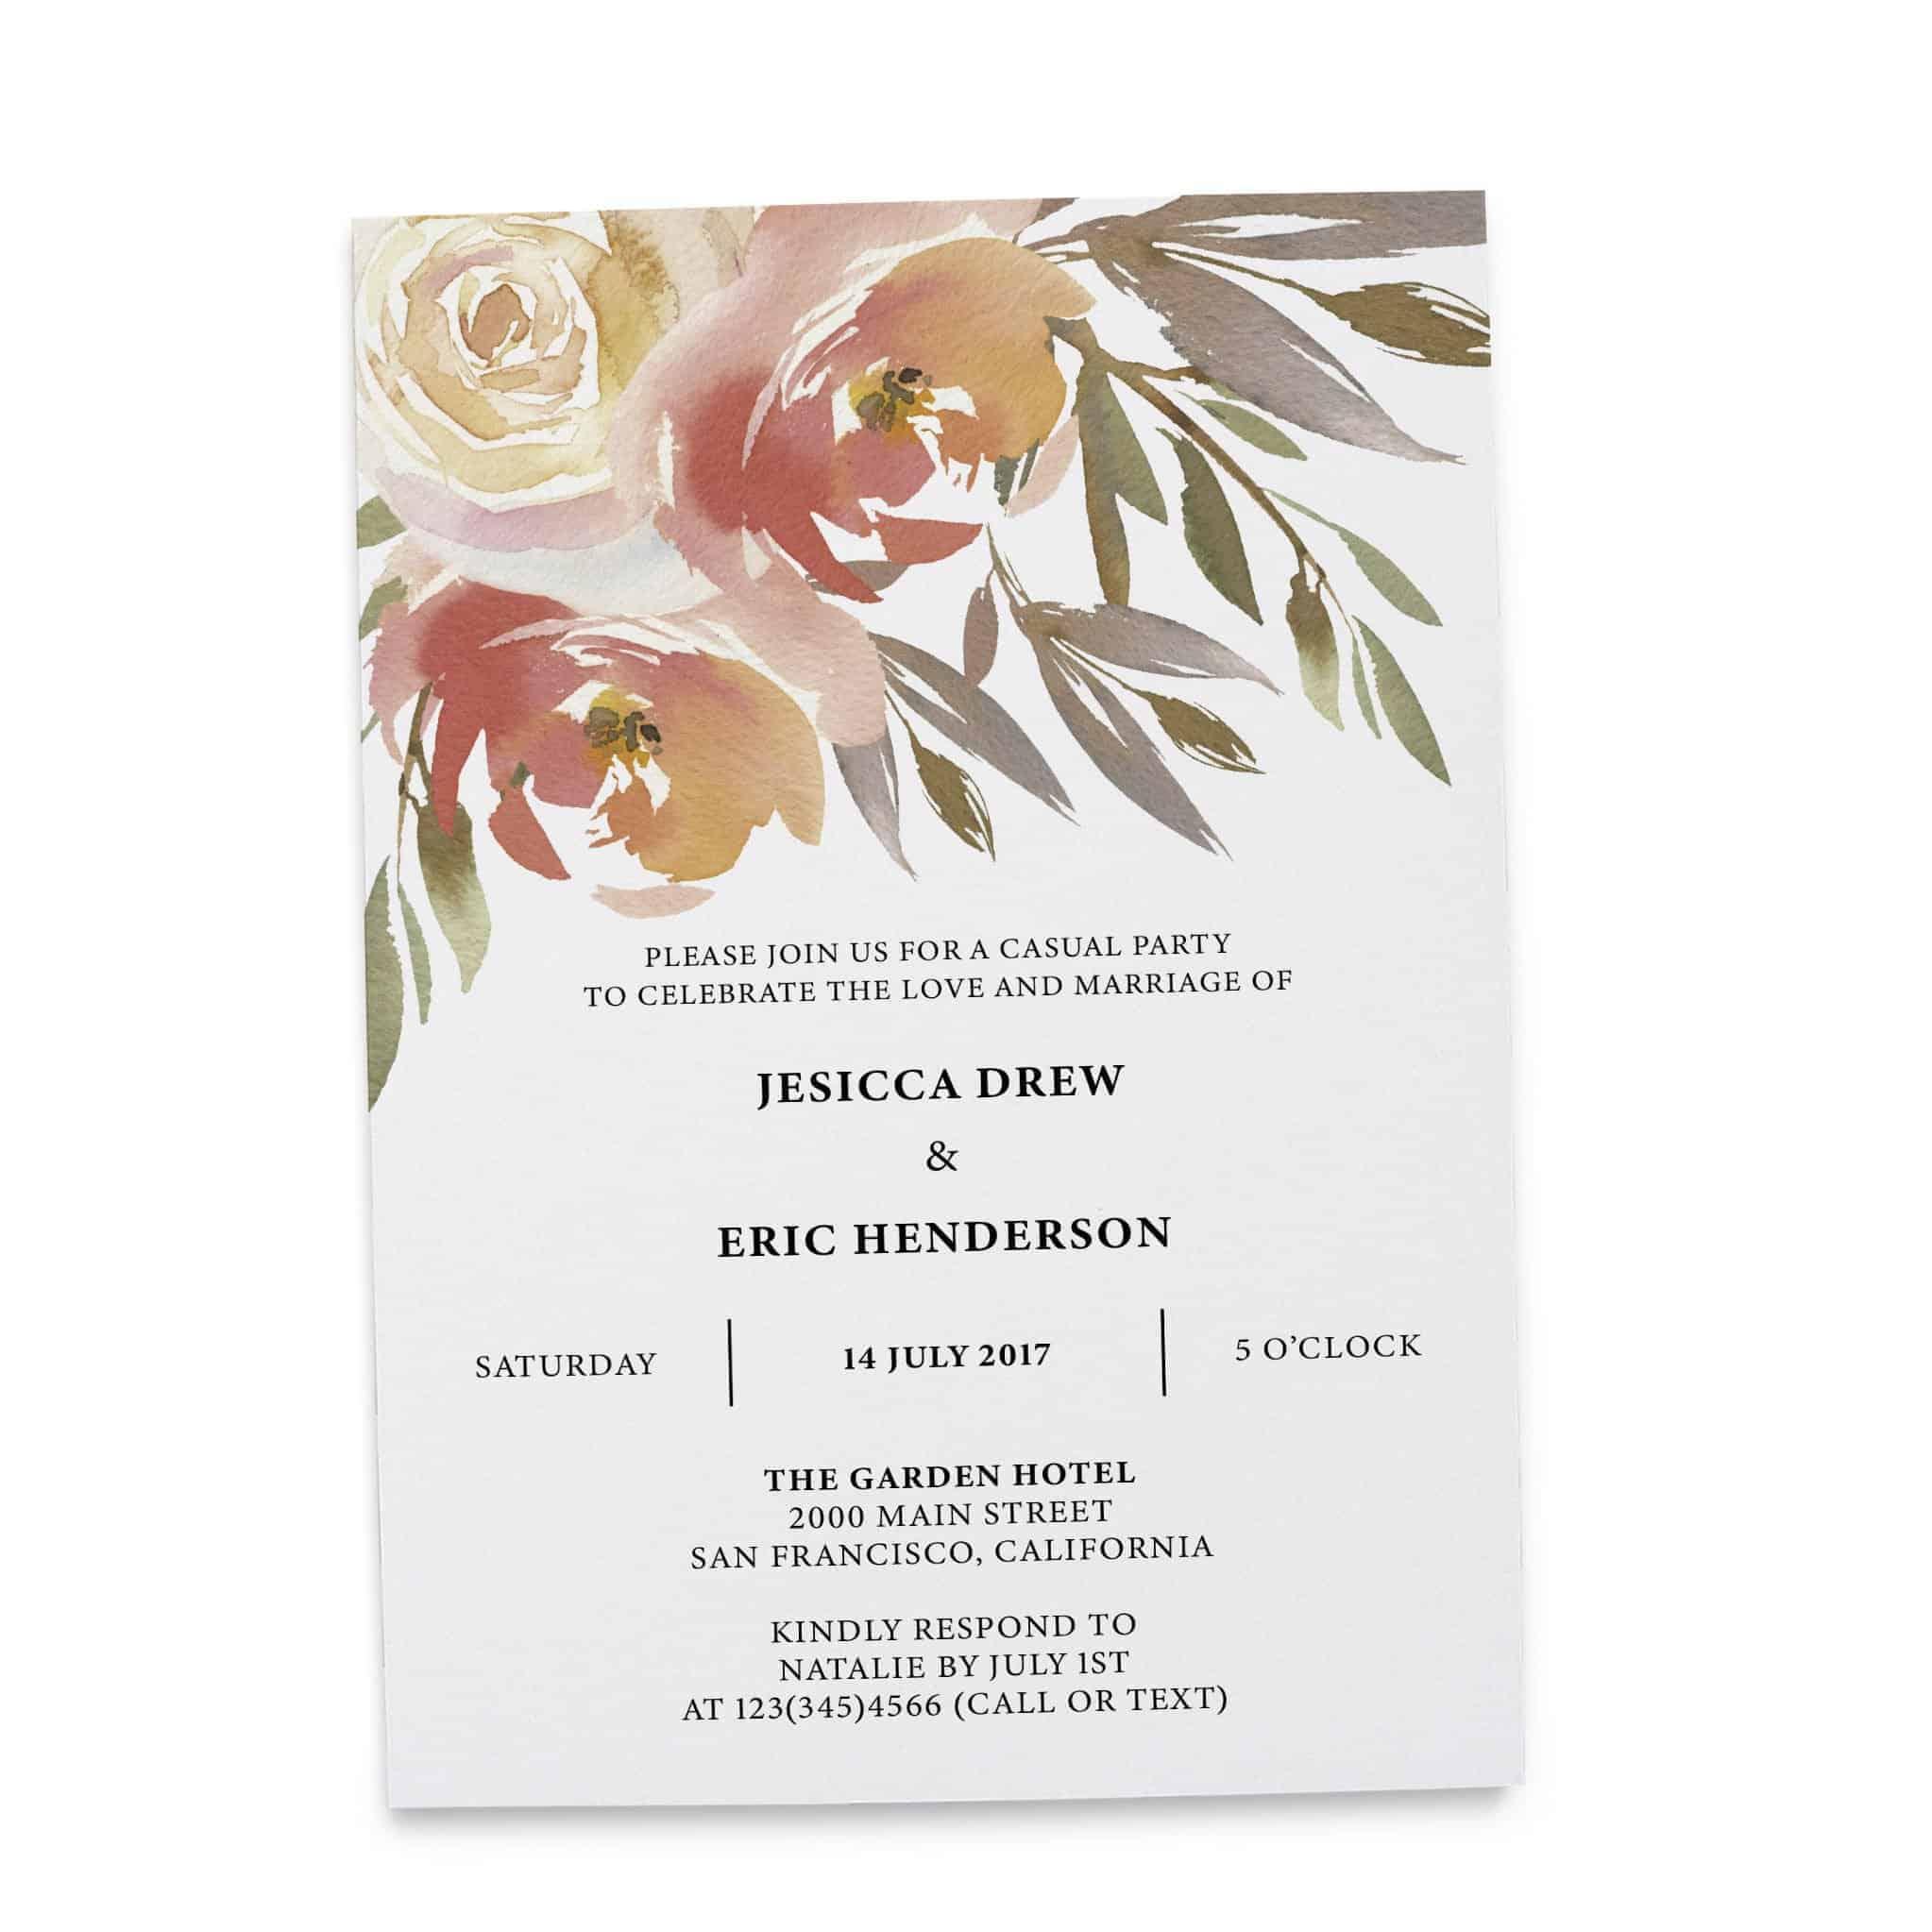 Elopement Reception Invitation Cards, Wedding Reception Invitations, Floral Invitation Card- Gentle Watercolor Flowers Design